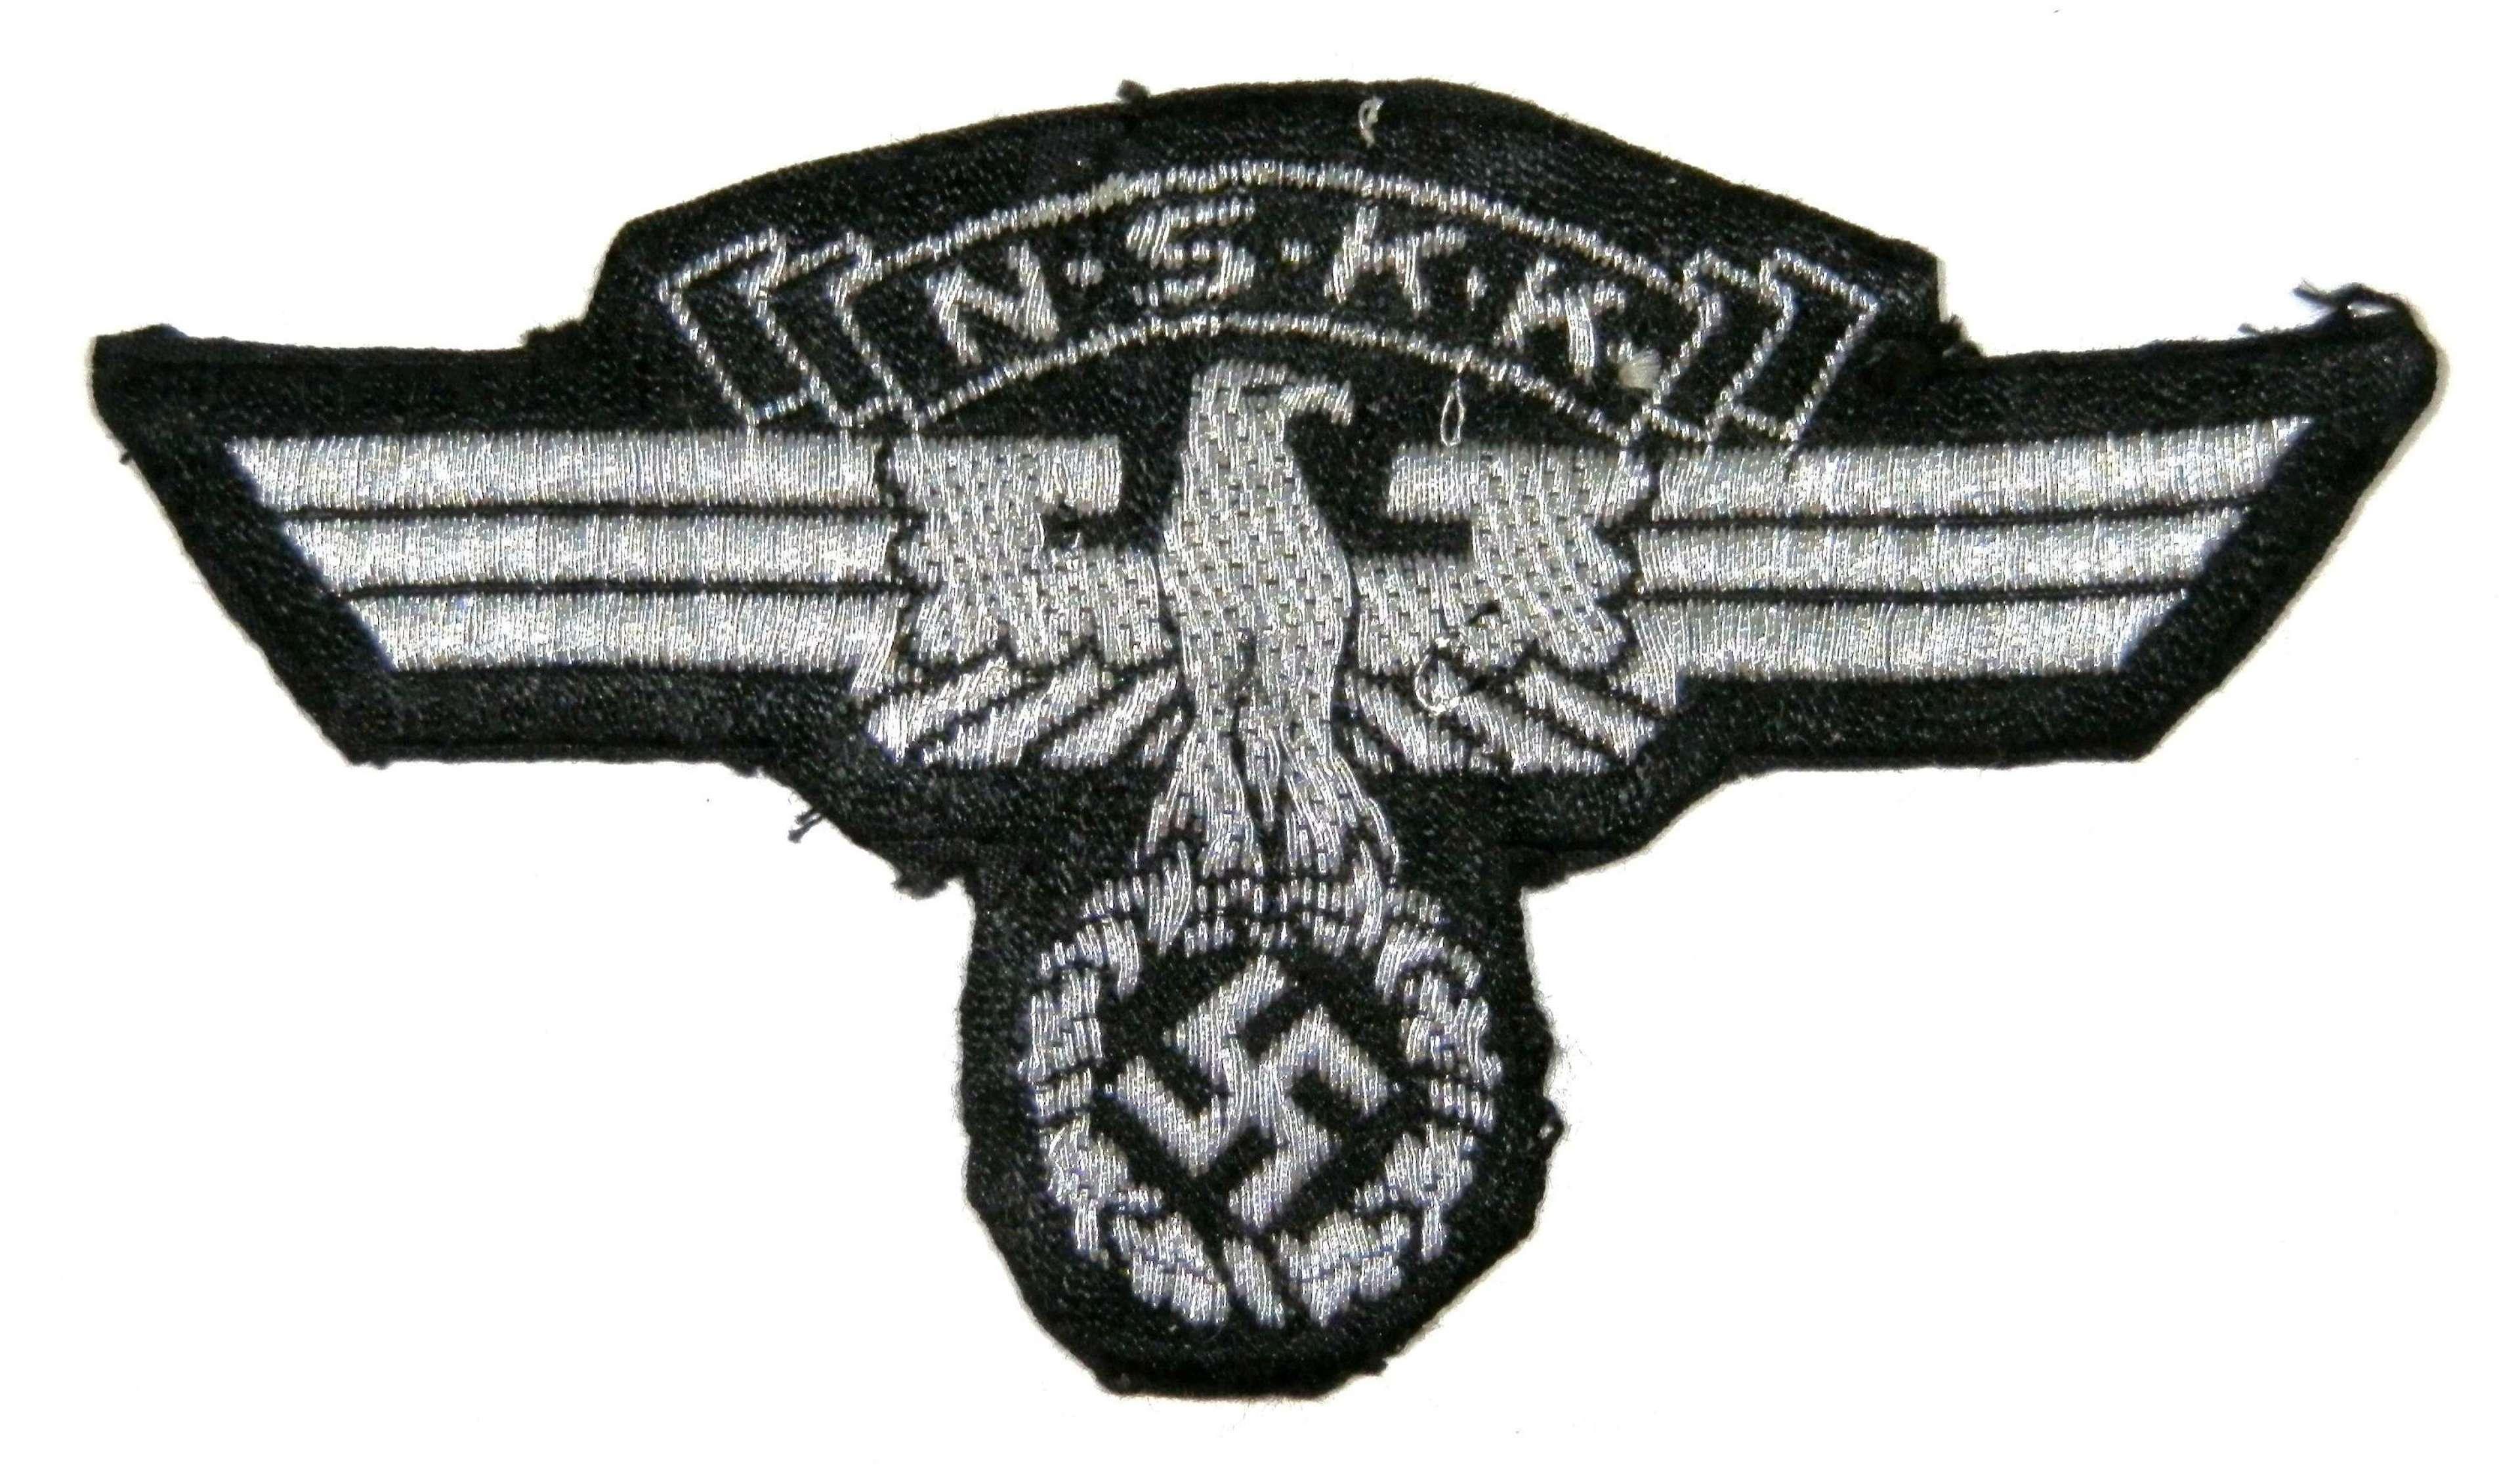 NSKK Reichs Transport Corps. Cap Insignia.